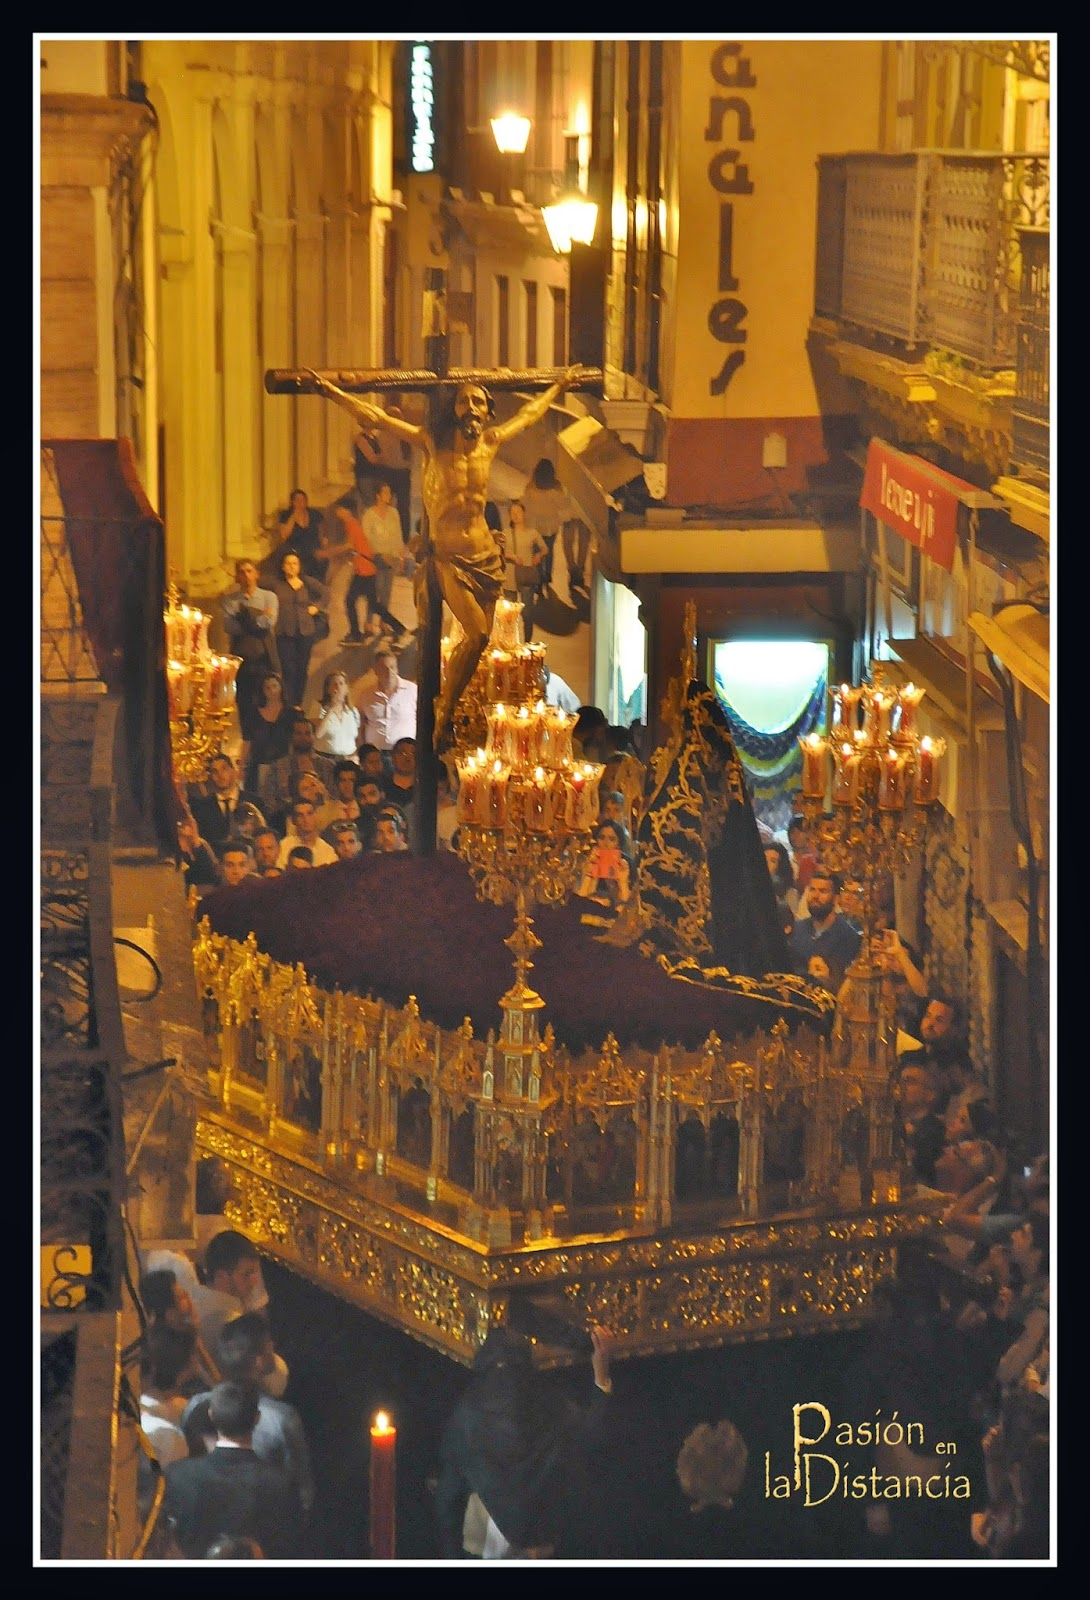 Hermandad-de-Santa-Cruz-Semana-Santa-Sevilla-2015